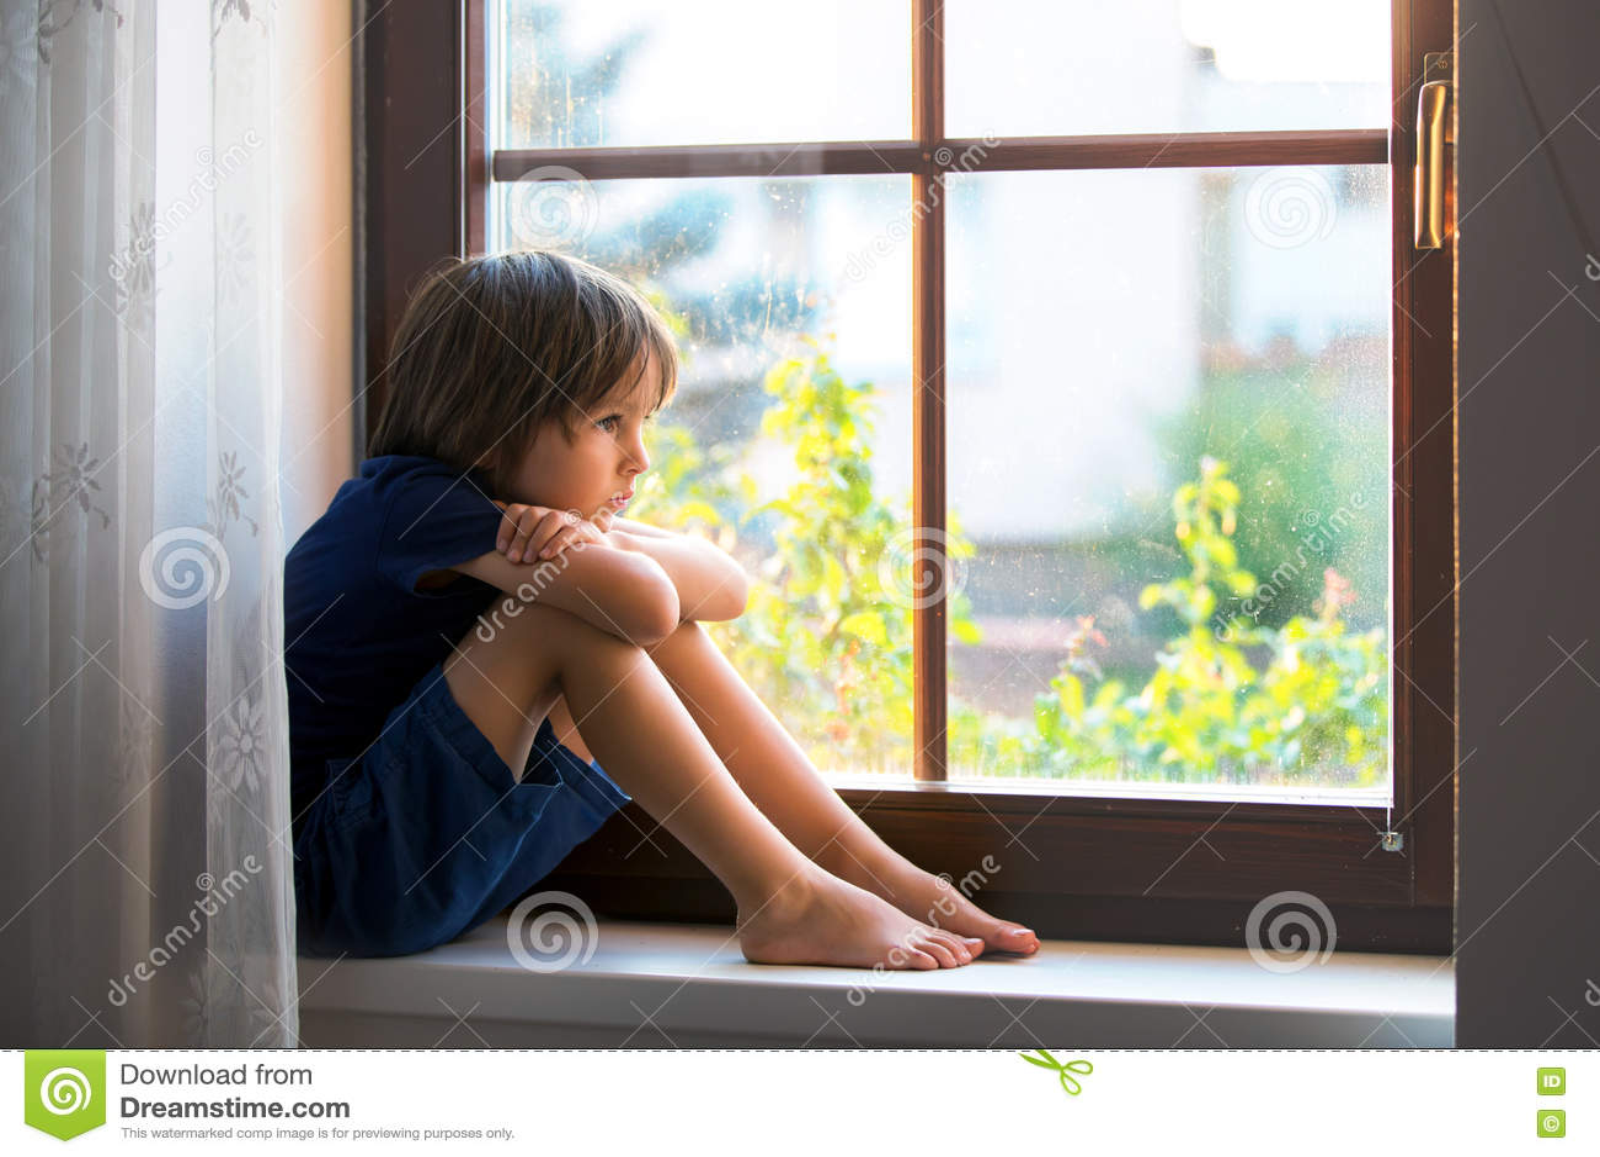 Sad Child Boy Sitting On A Window Shield Stock Image